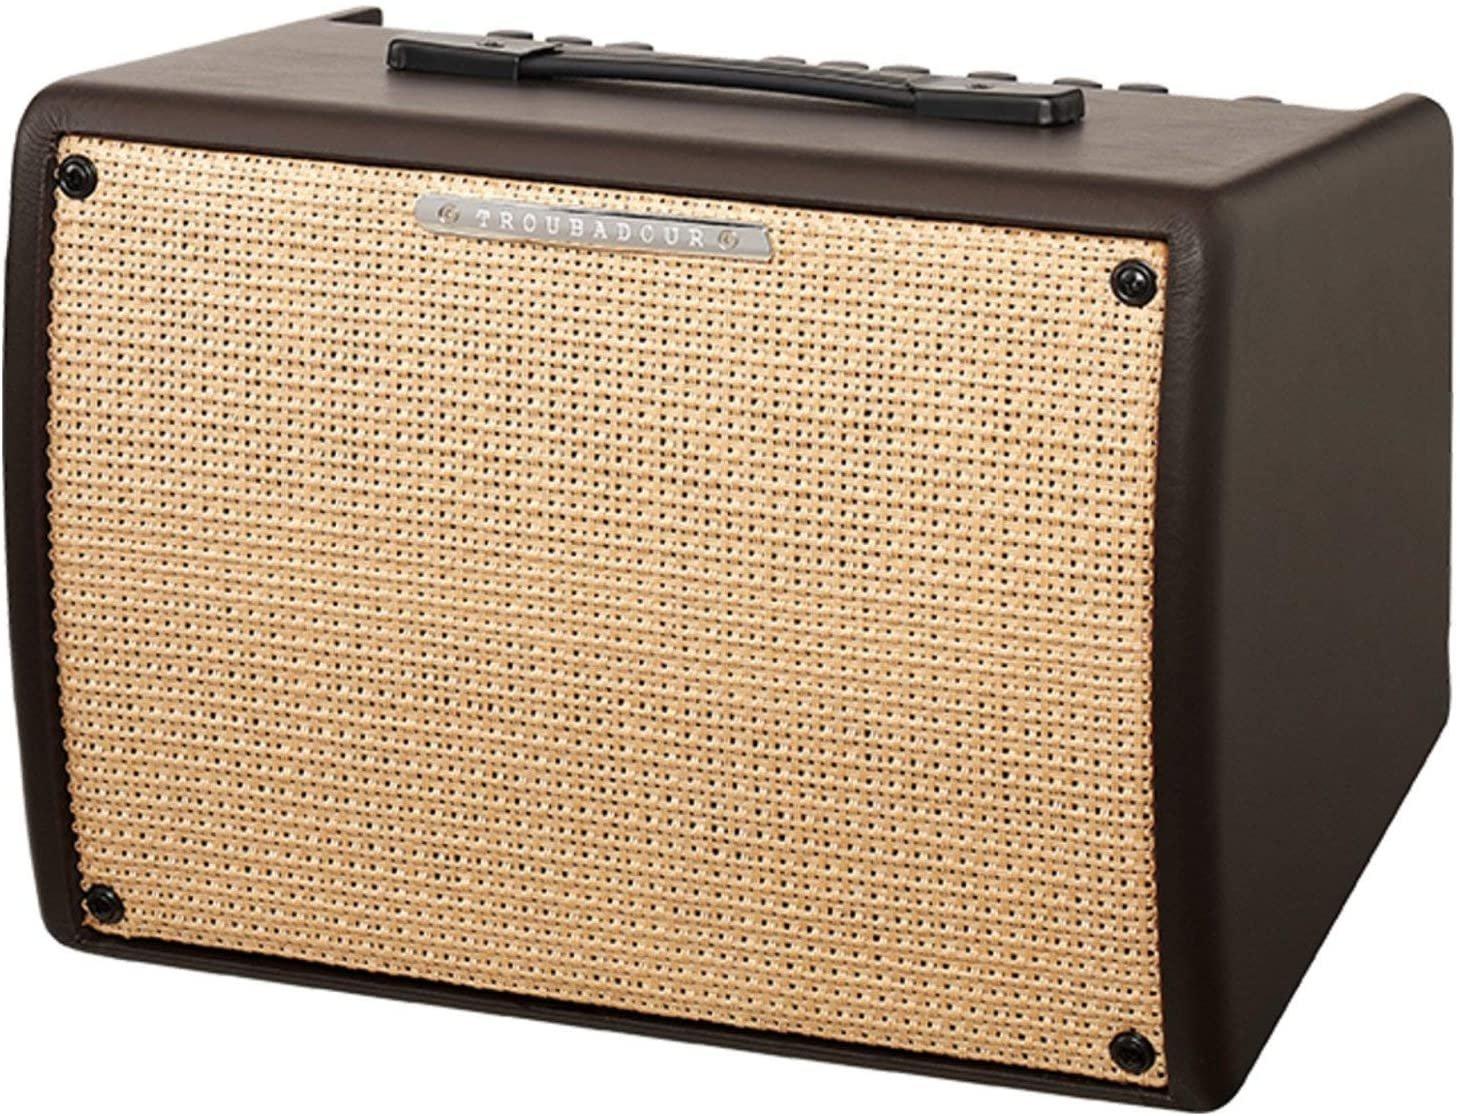 Ibanez T30II Troubadour 30w Acoustic Guitar Amp